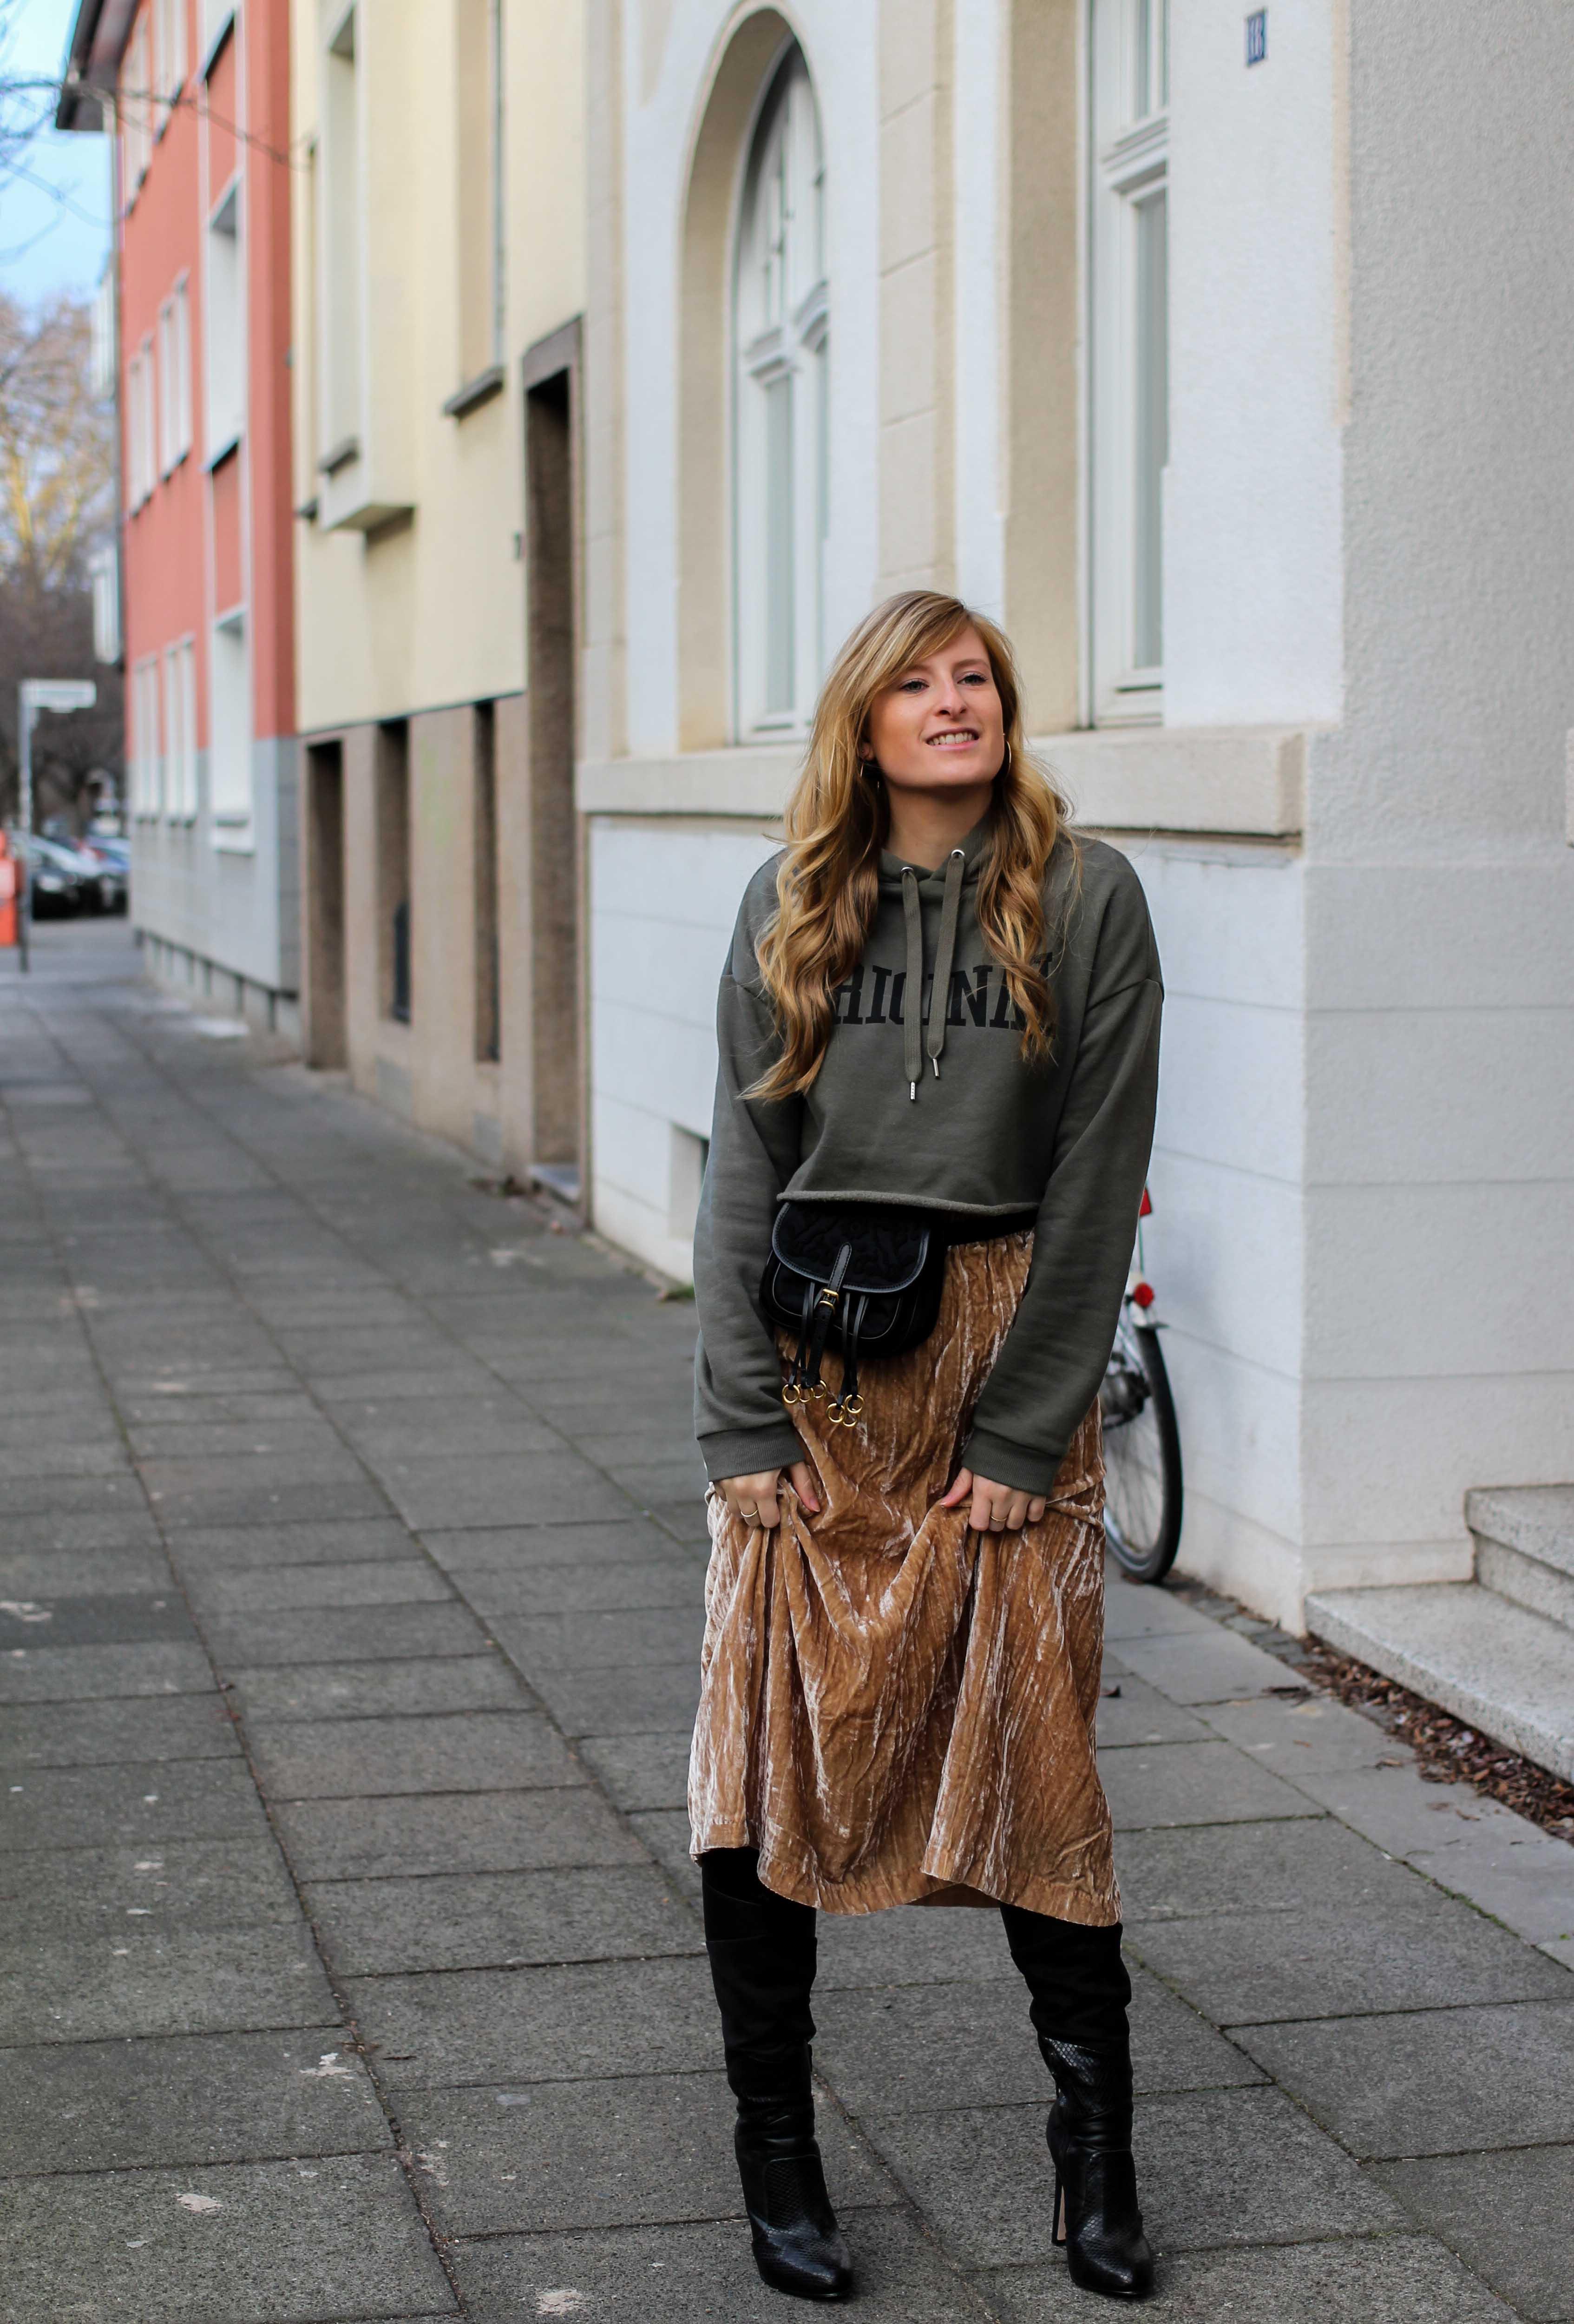 Trendtasche 2019 Gürteltasche kombiniern Gürteltasche Prada Streetstyle Outfit Bonn Frühling Look Crop Pullover 93